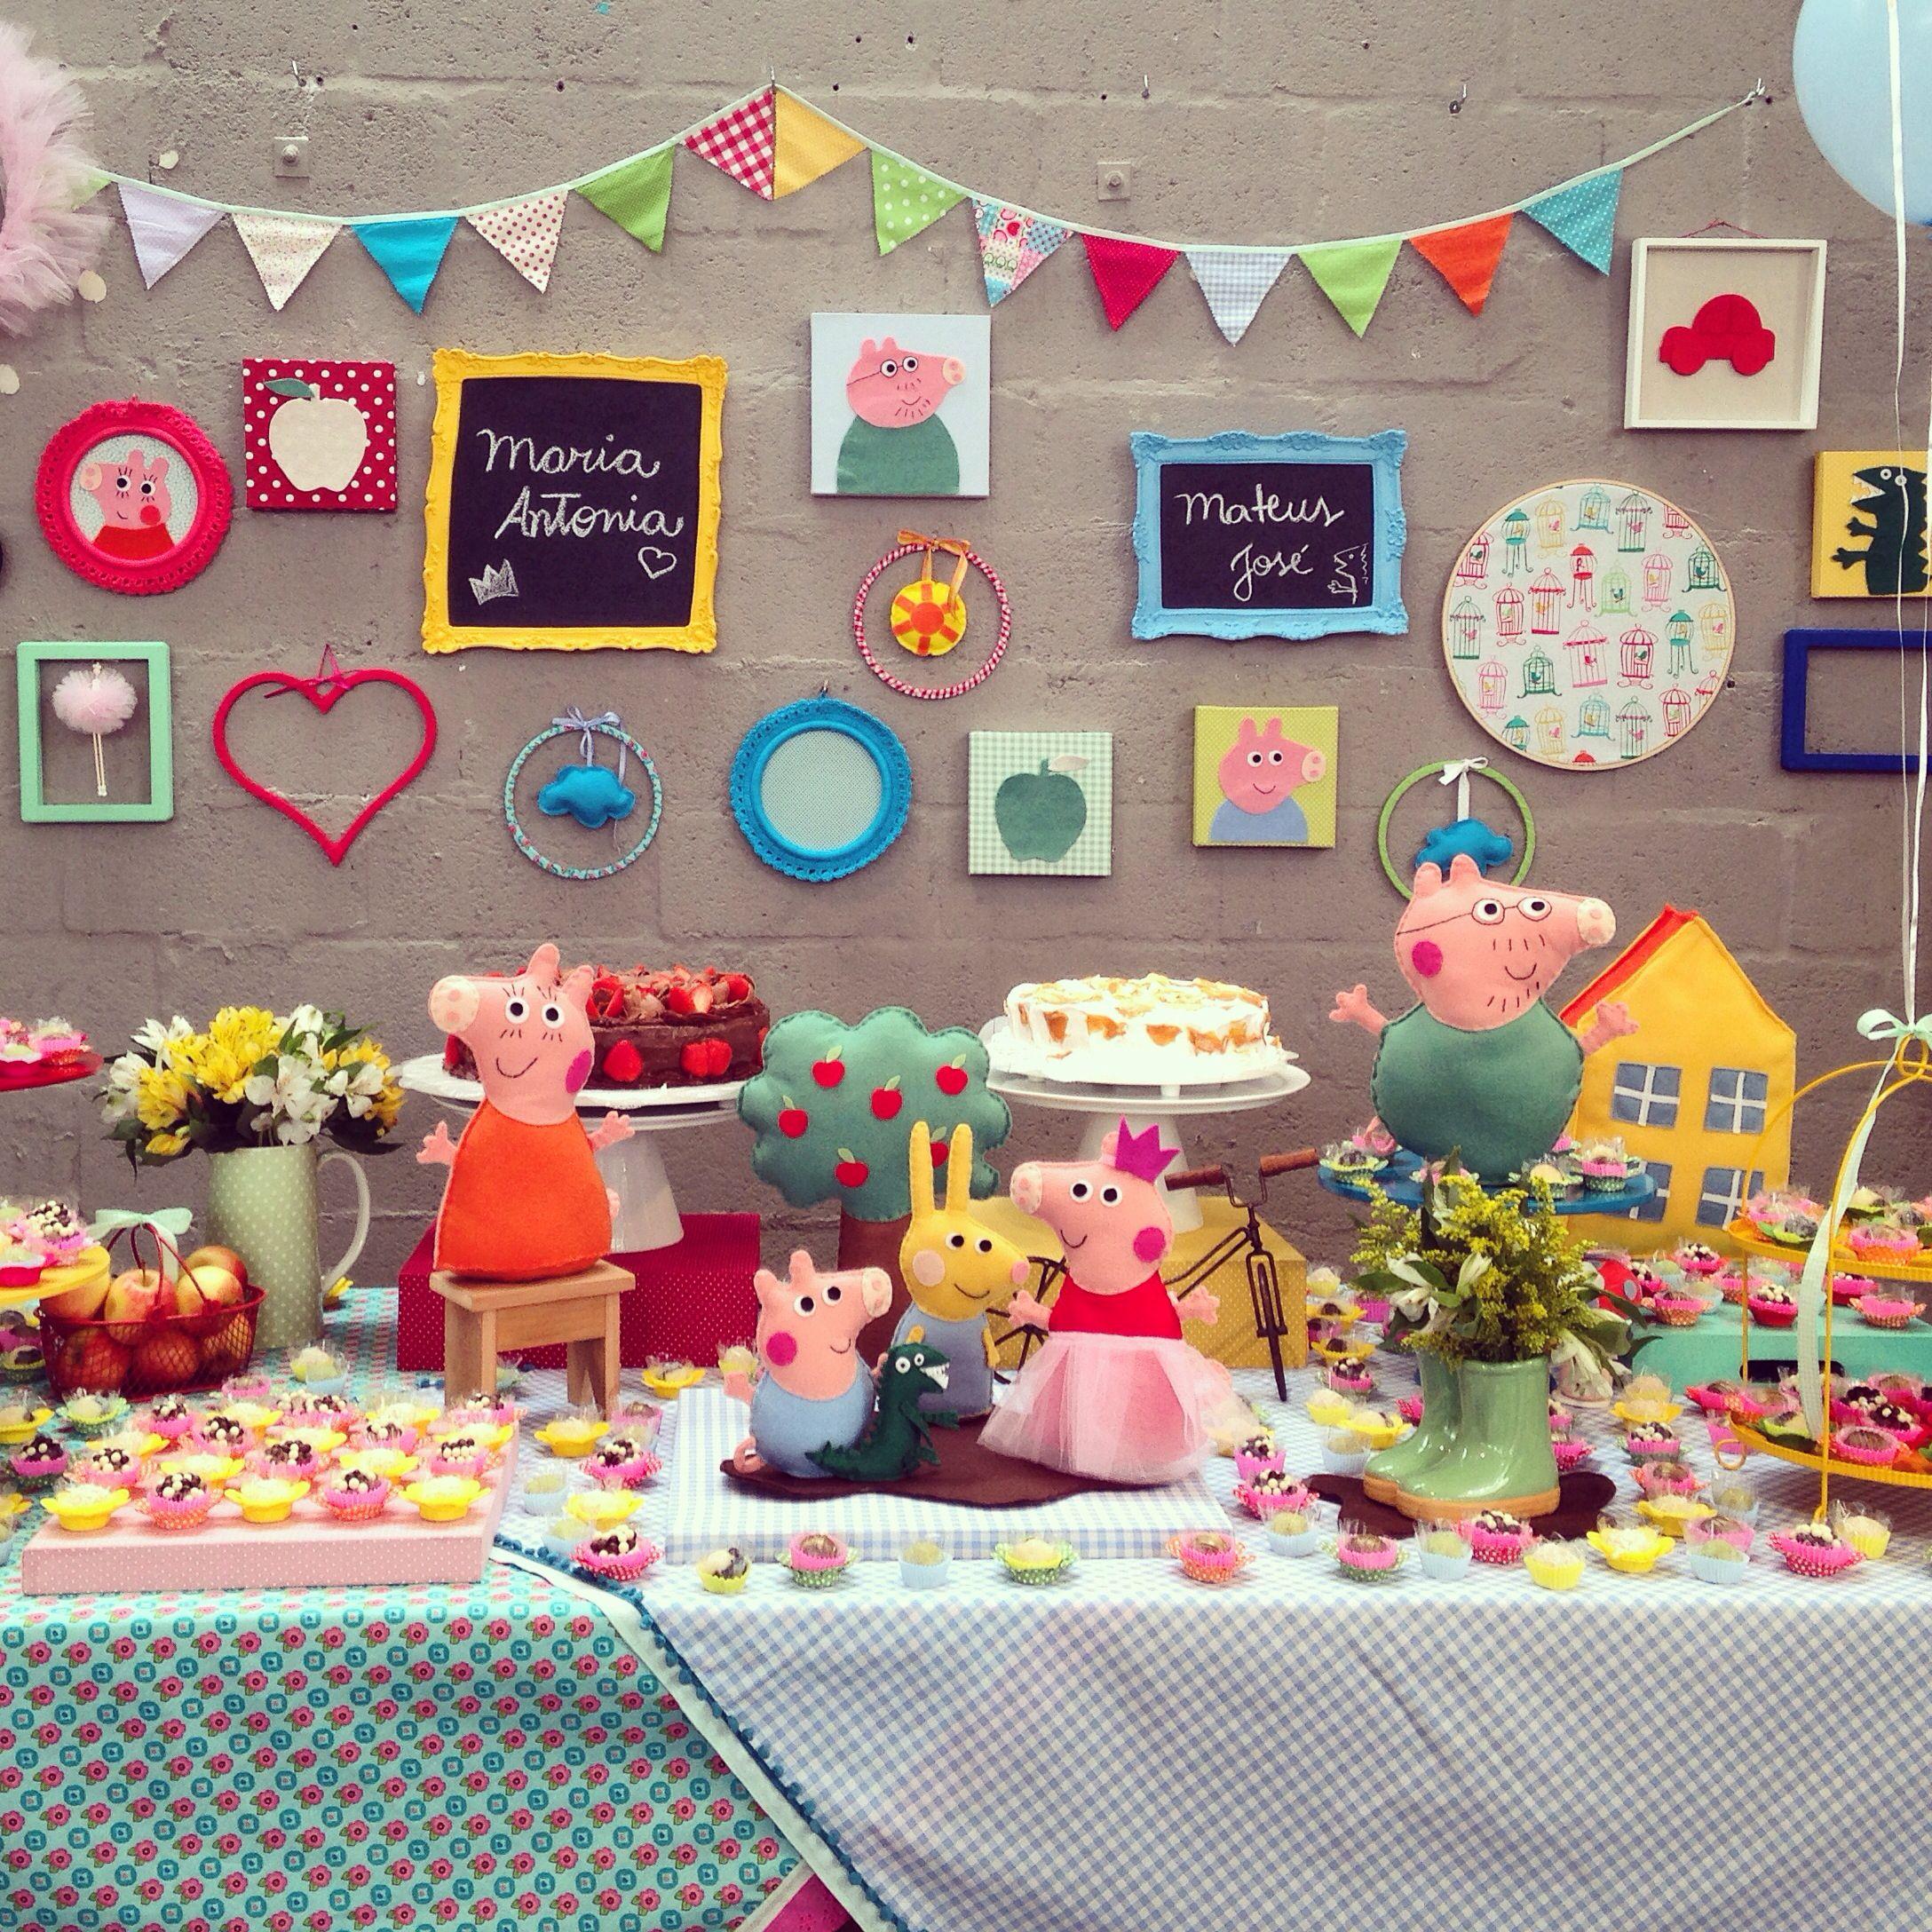 Festa Peppa Pig Decoracao Mini Mimo Festas Festa Peppa Pig